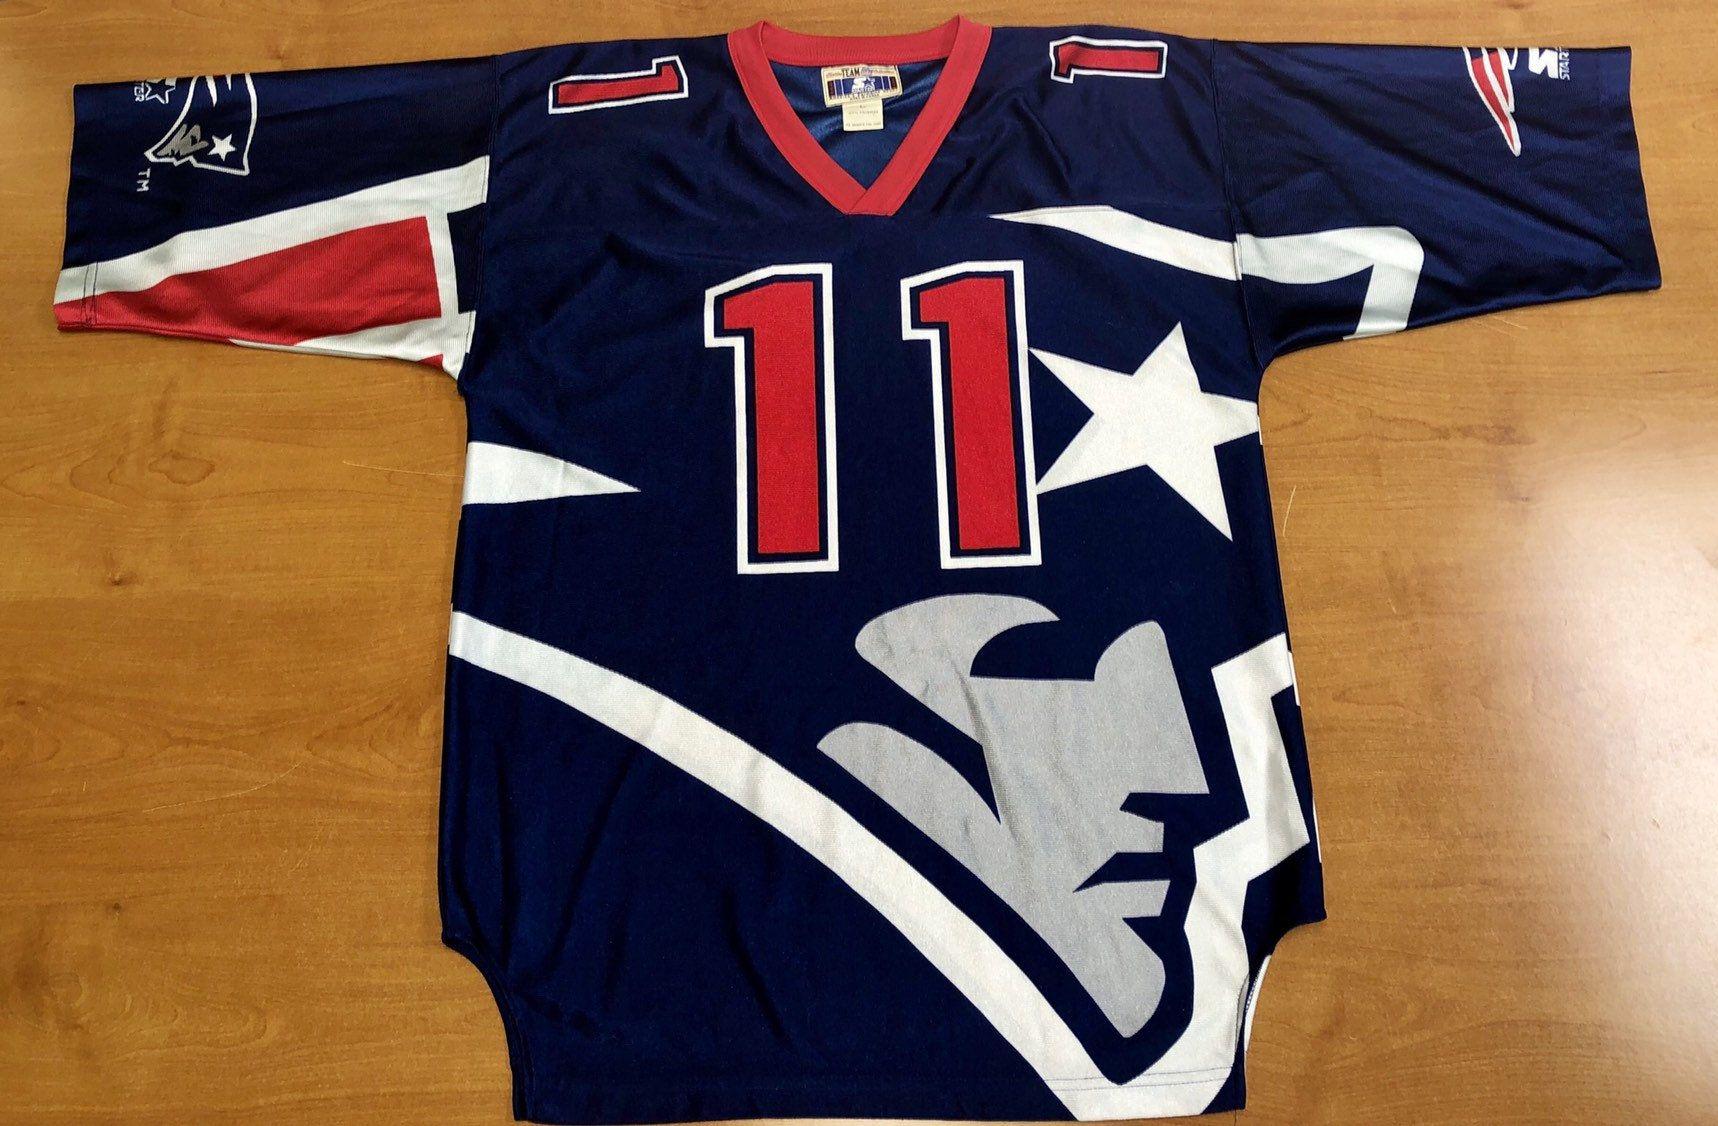 Vintage 1996 Drew Bledsoe New England Patriots Starter Jersey Belichick Sweatshirt Julian Edelman Adam Vinati New England Patriots Drew Bledsoe Jersey Patriots